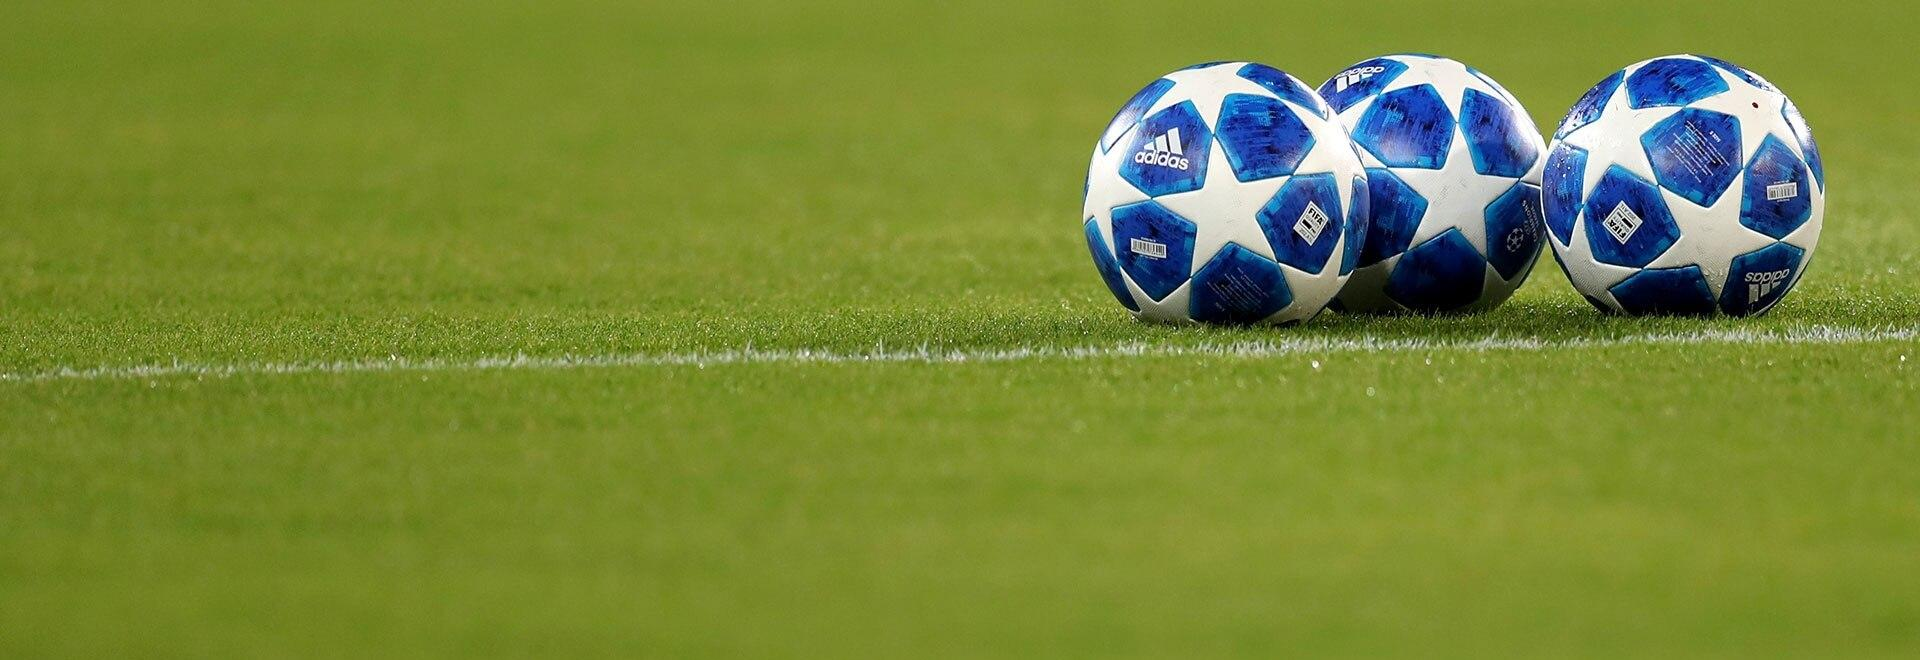 Barcellona - Arsenal 08/03/11. Ottavi Ritorno